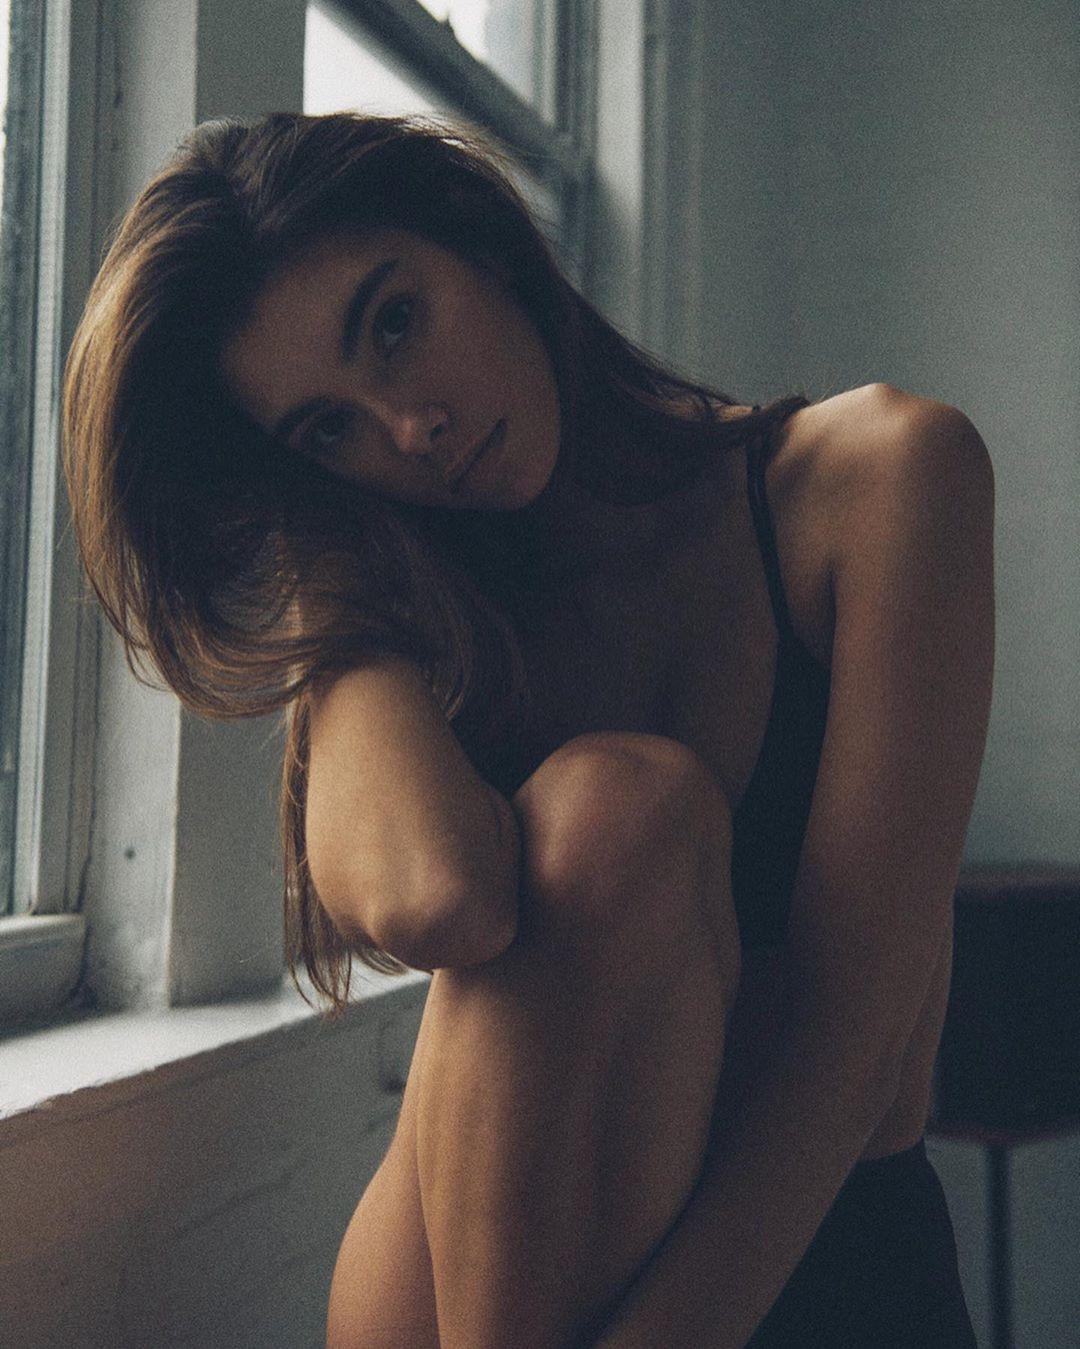 Cindy Mello legs pic, arms pic, Pretty Look